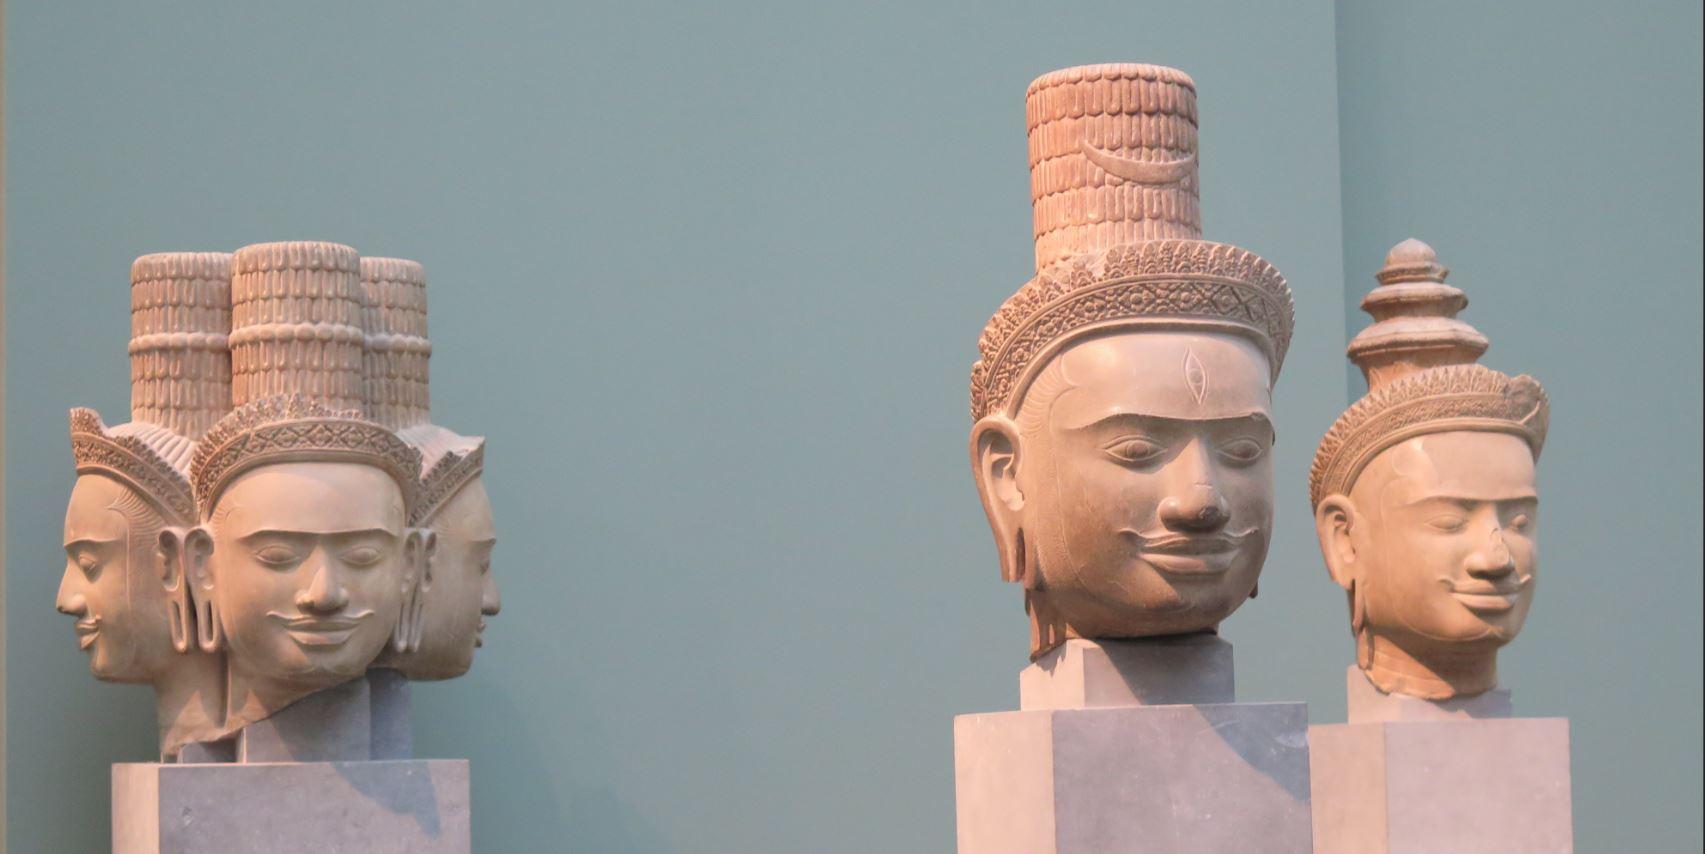 brahma musée guimet